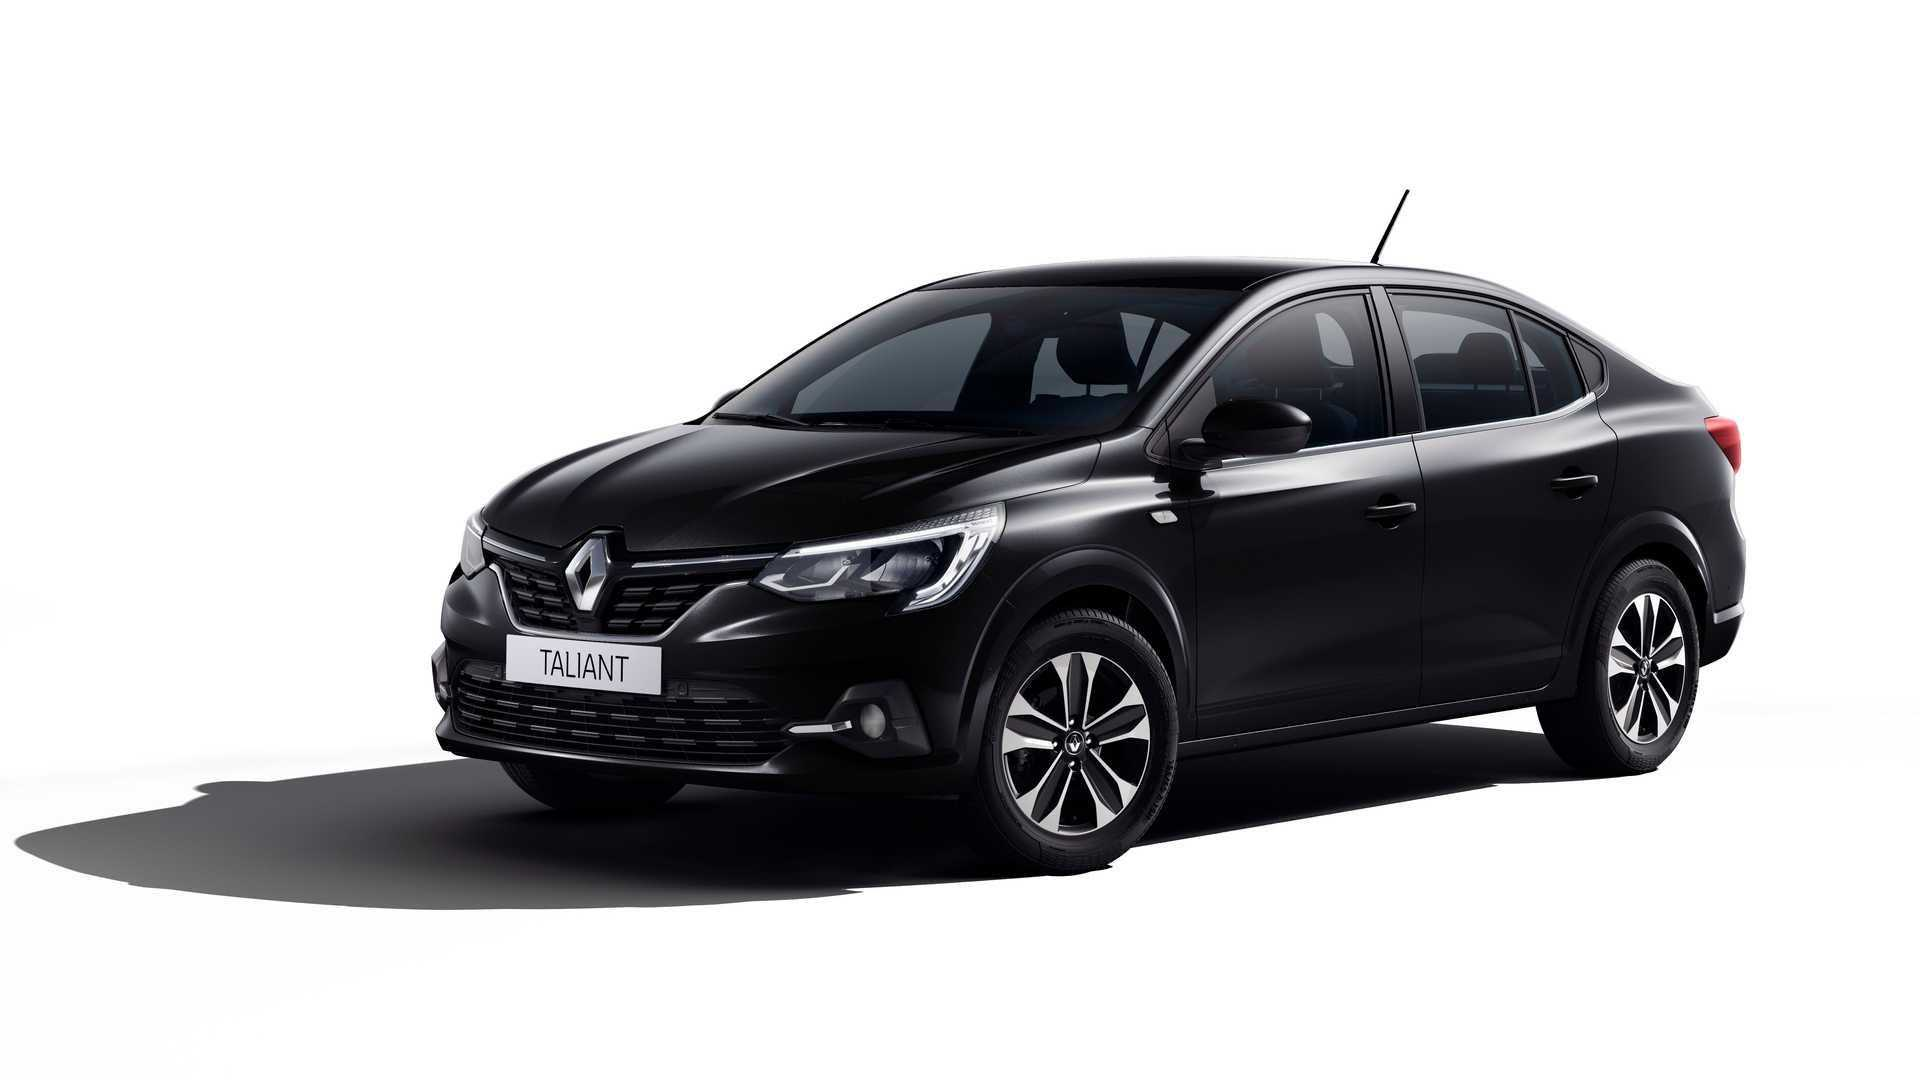 2021_Renault_Taliant-0001